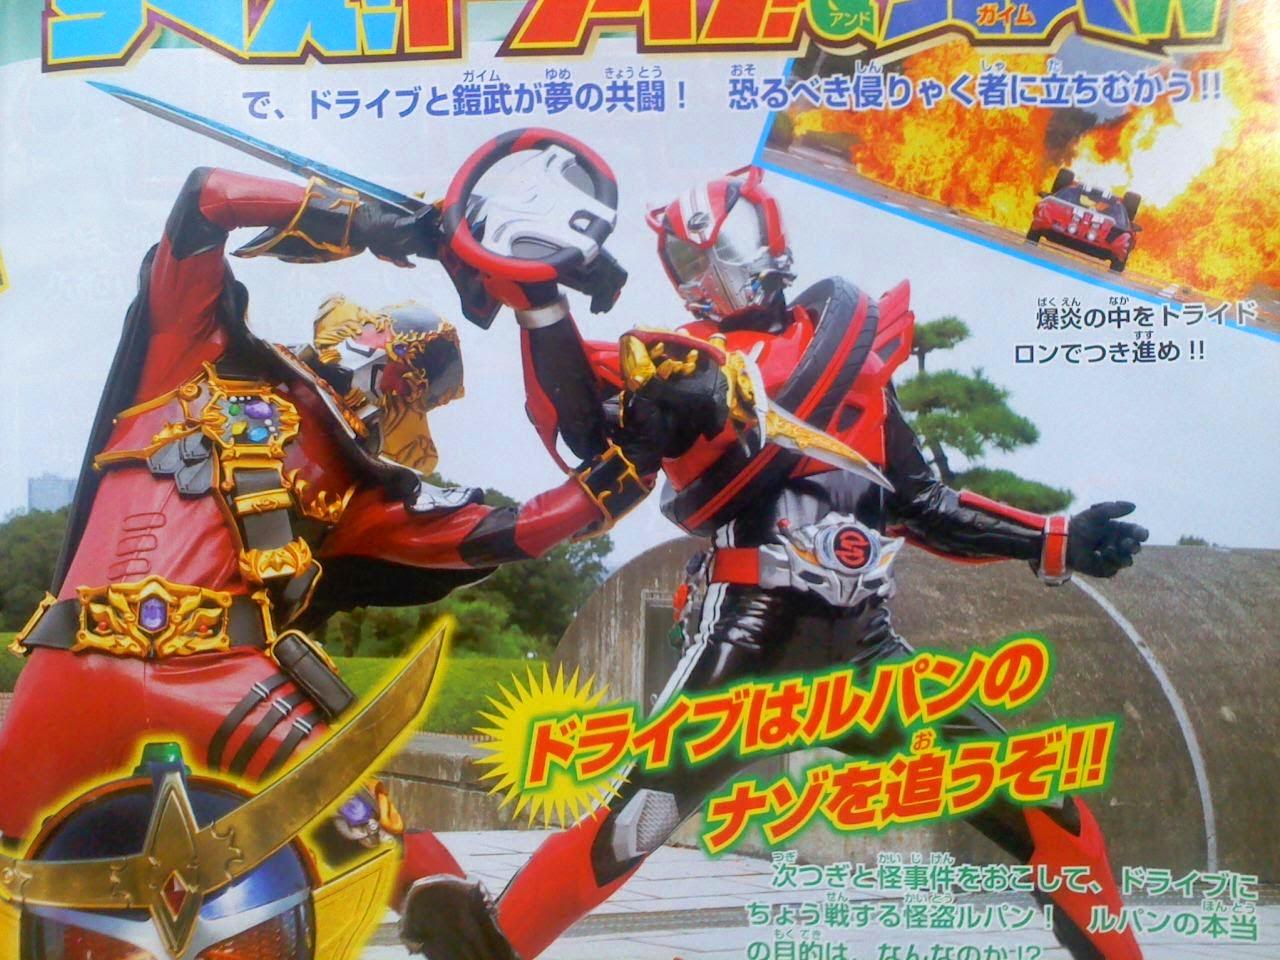 poster kamen rider drive the movie terbaru